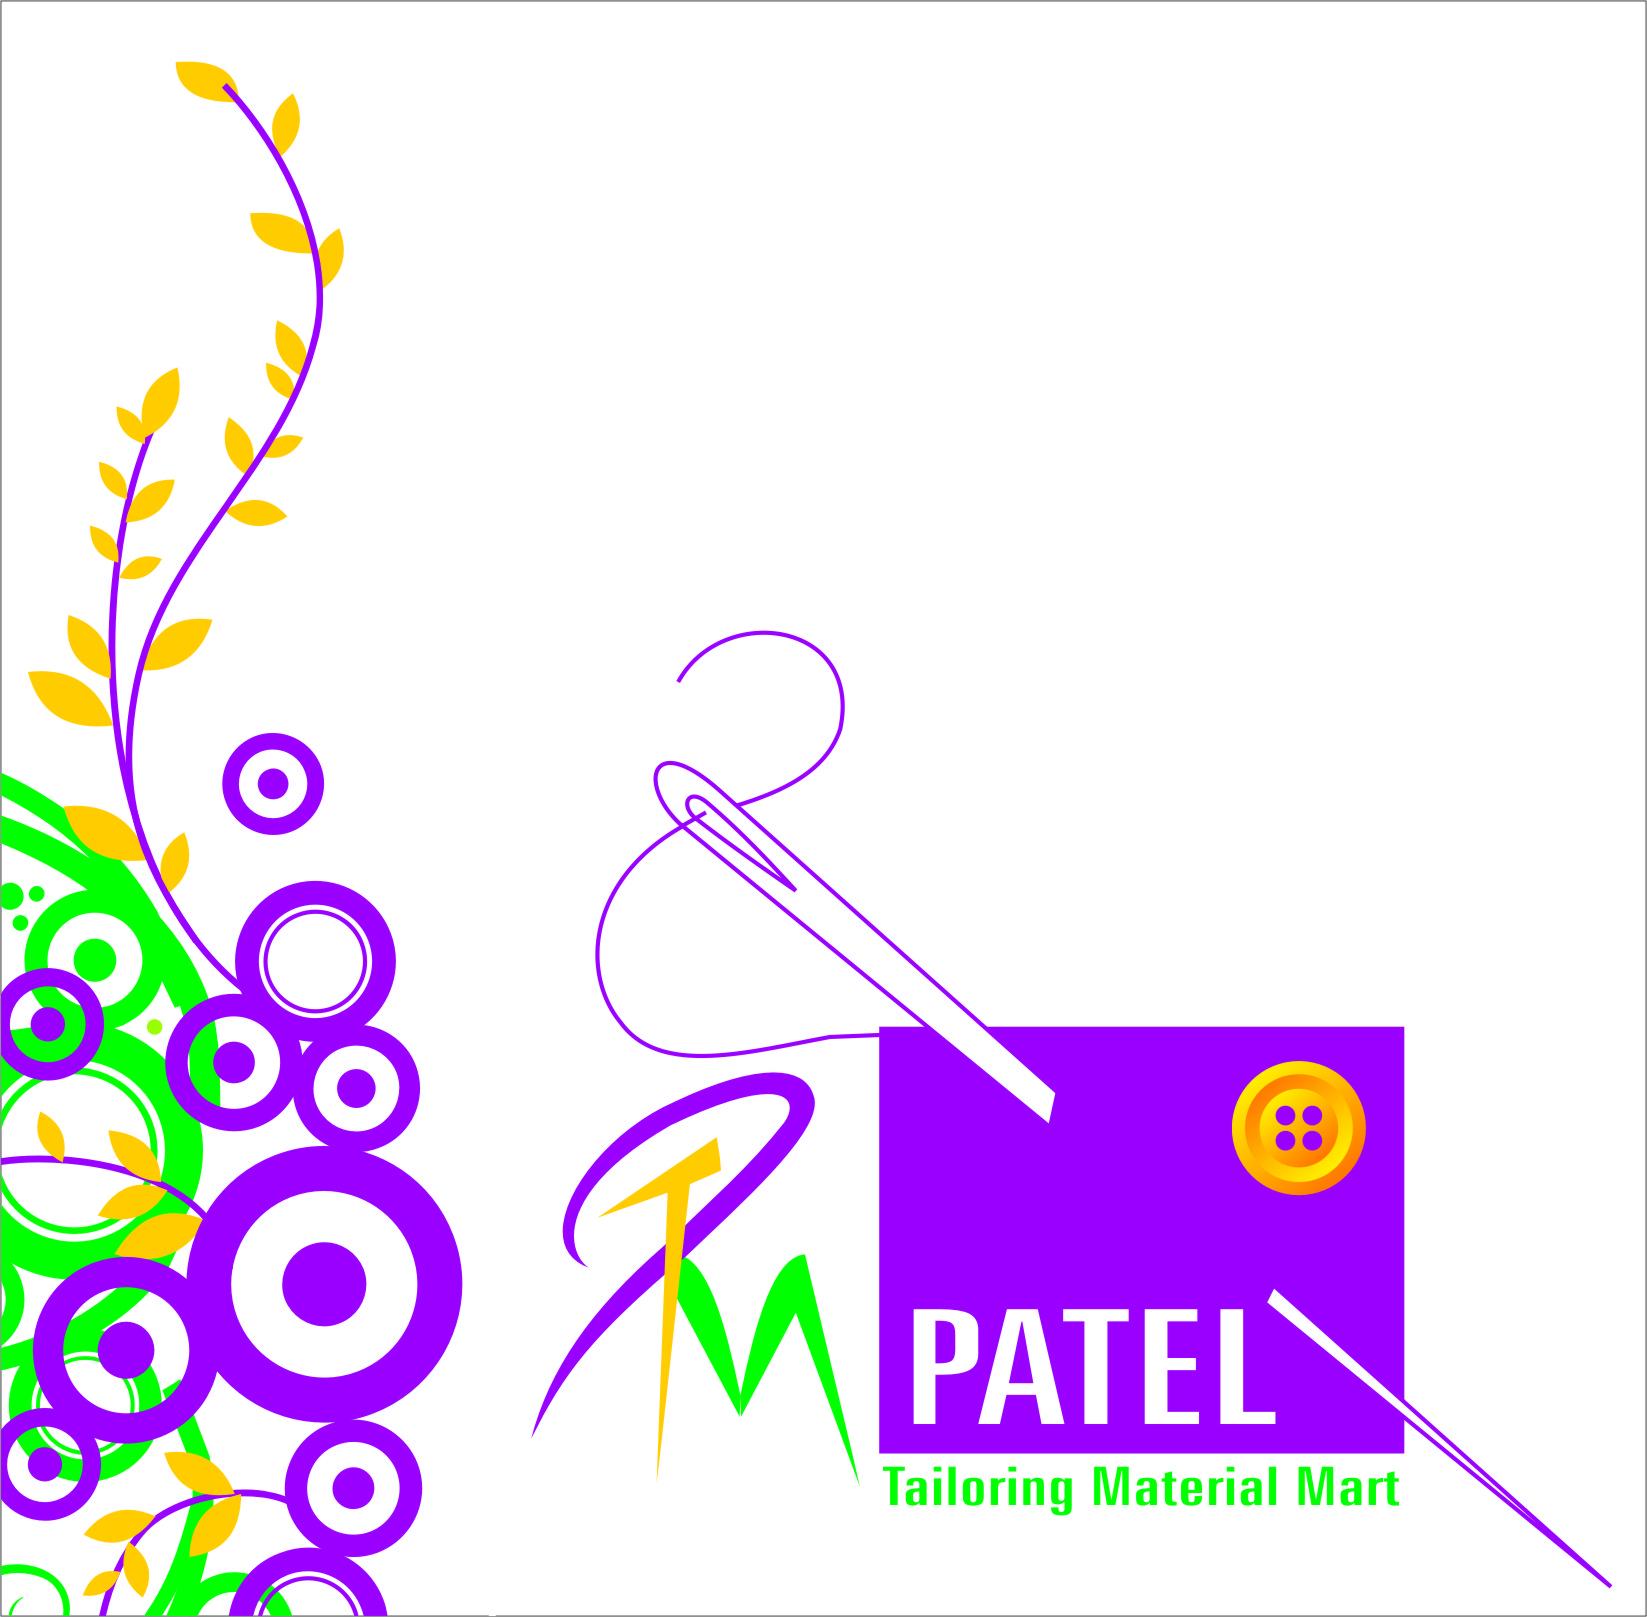 Patel Tailoring Material Mart - logo